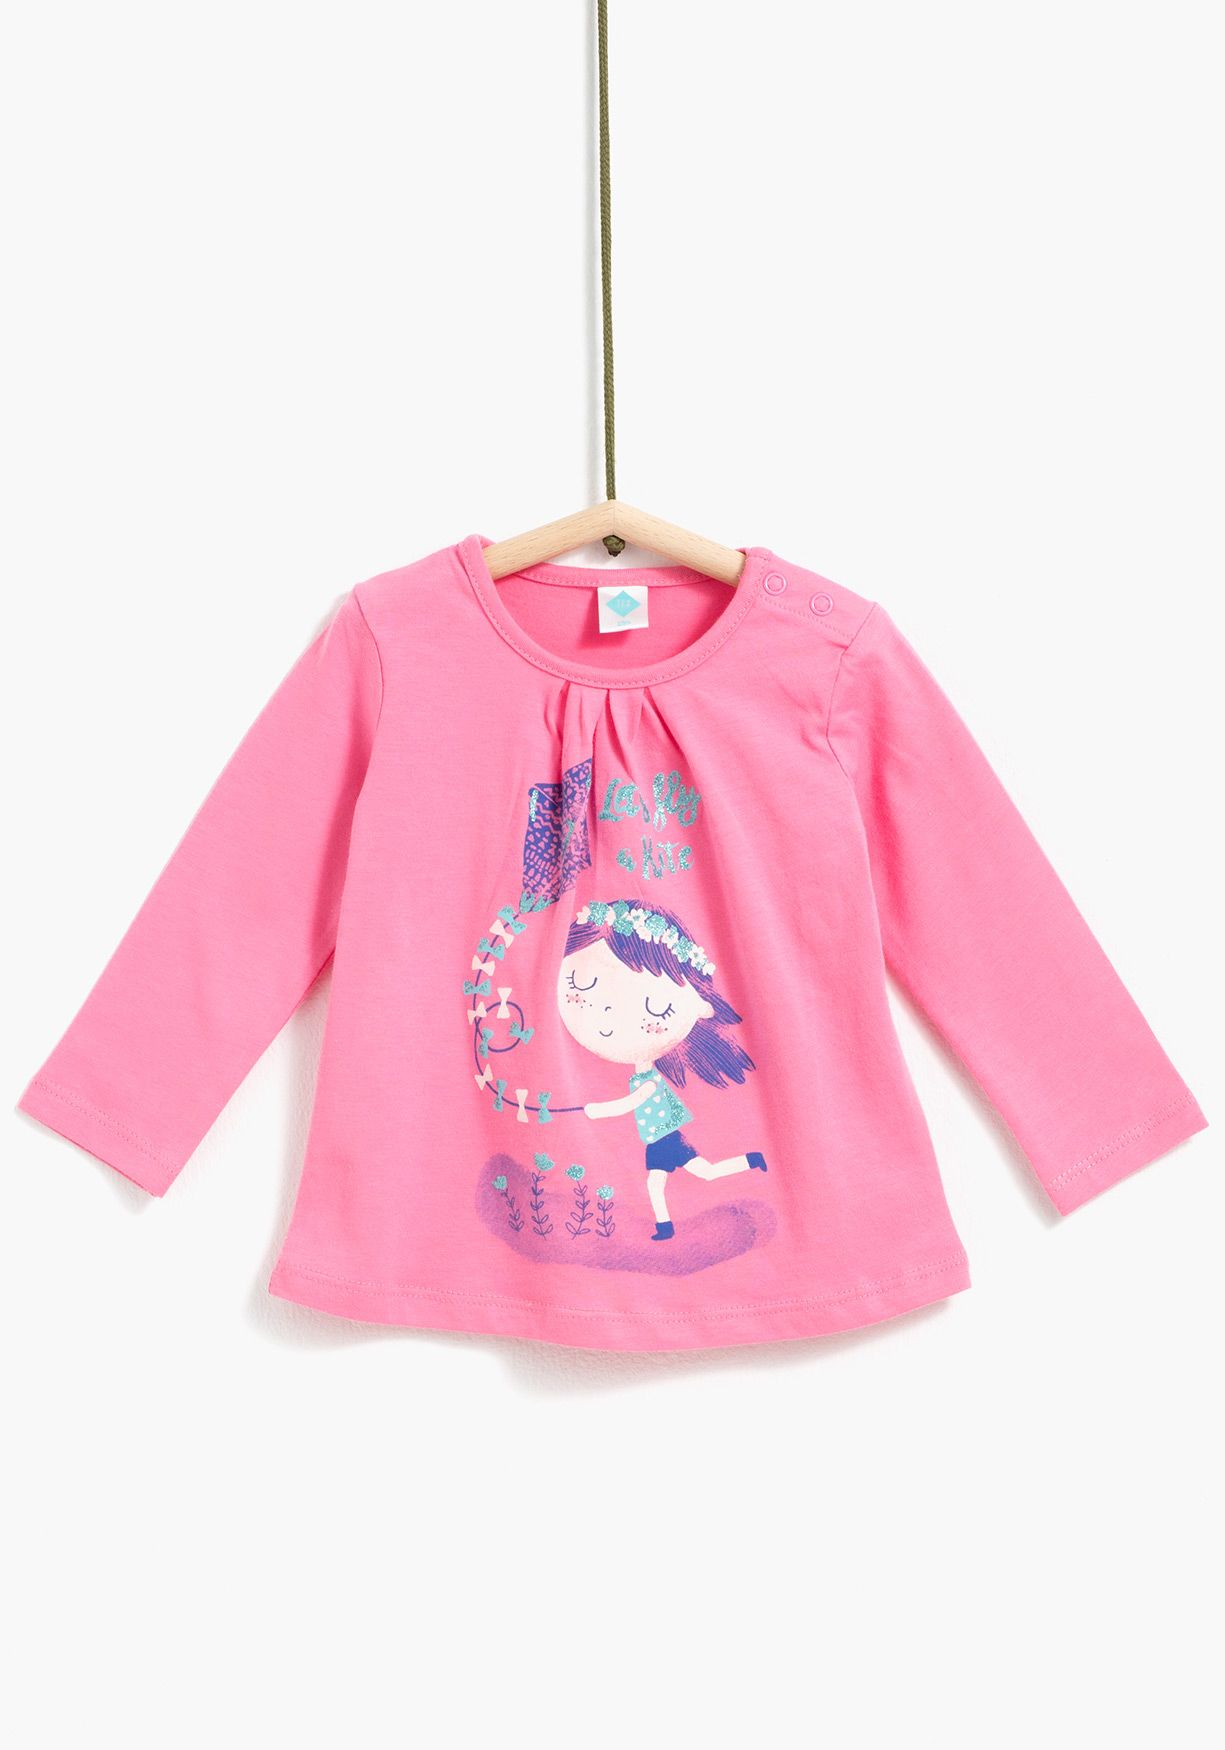 4b3e535f5 Camiseta de manga larga para niña cierre en el hombro con snapsAlgodón 96%  Elastano 4